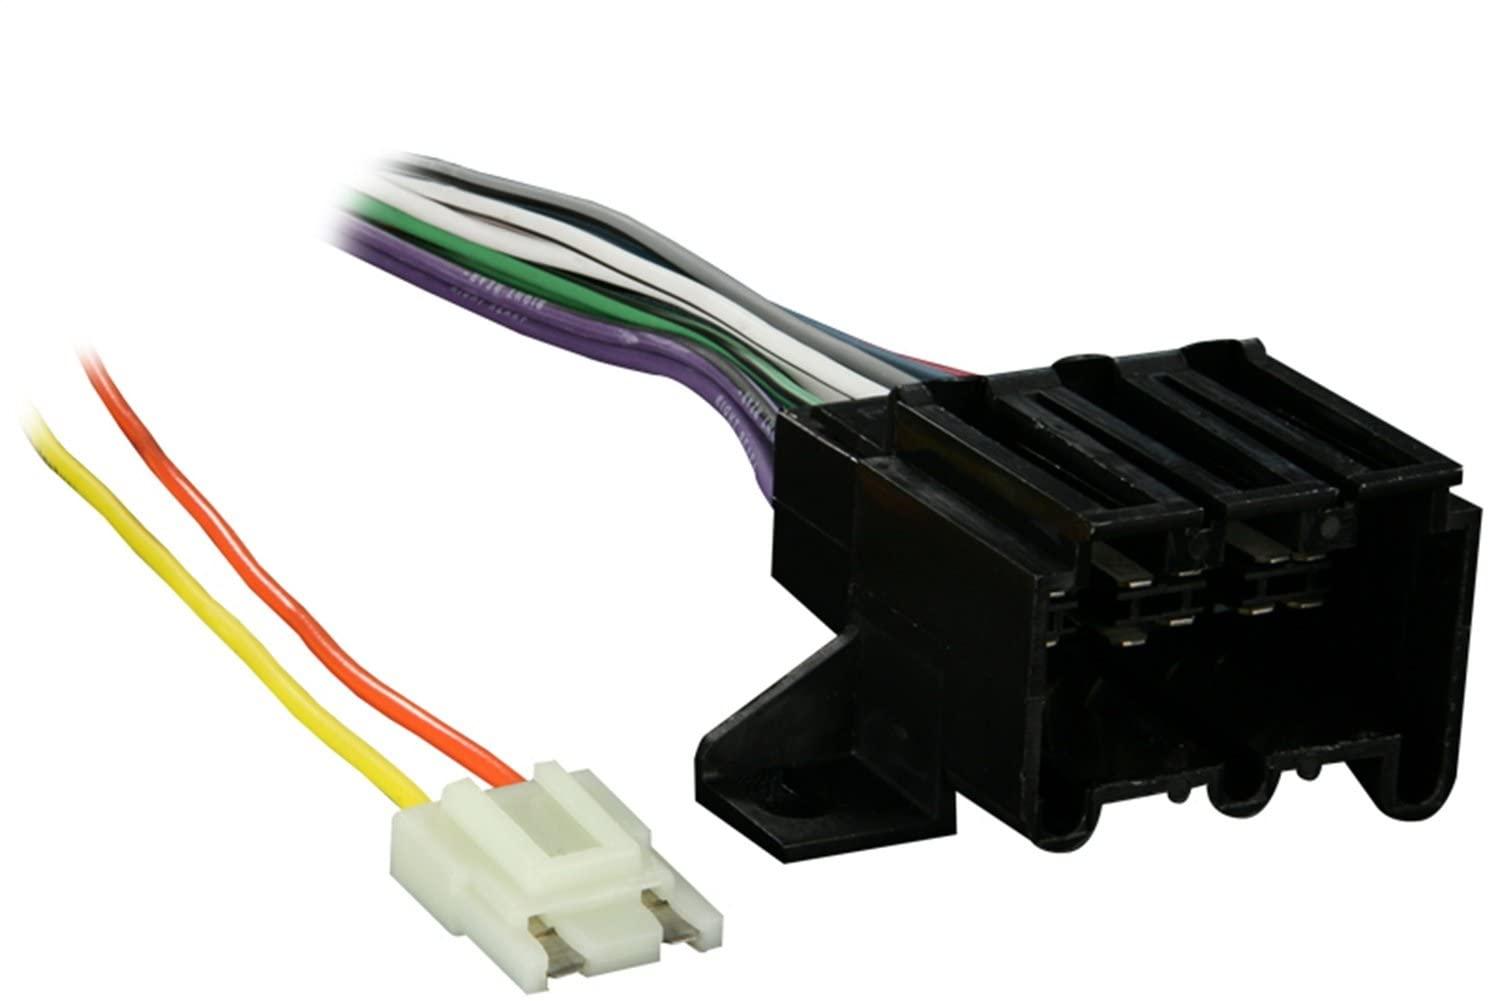 Metra 70-1677-1 Radio Wiring Harness for GM 73-90